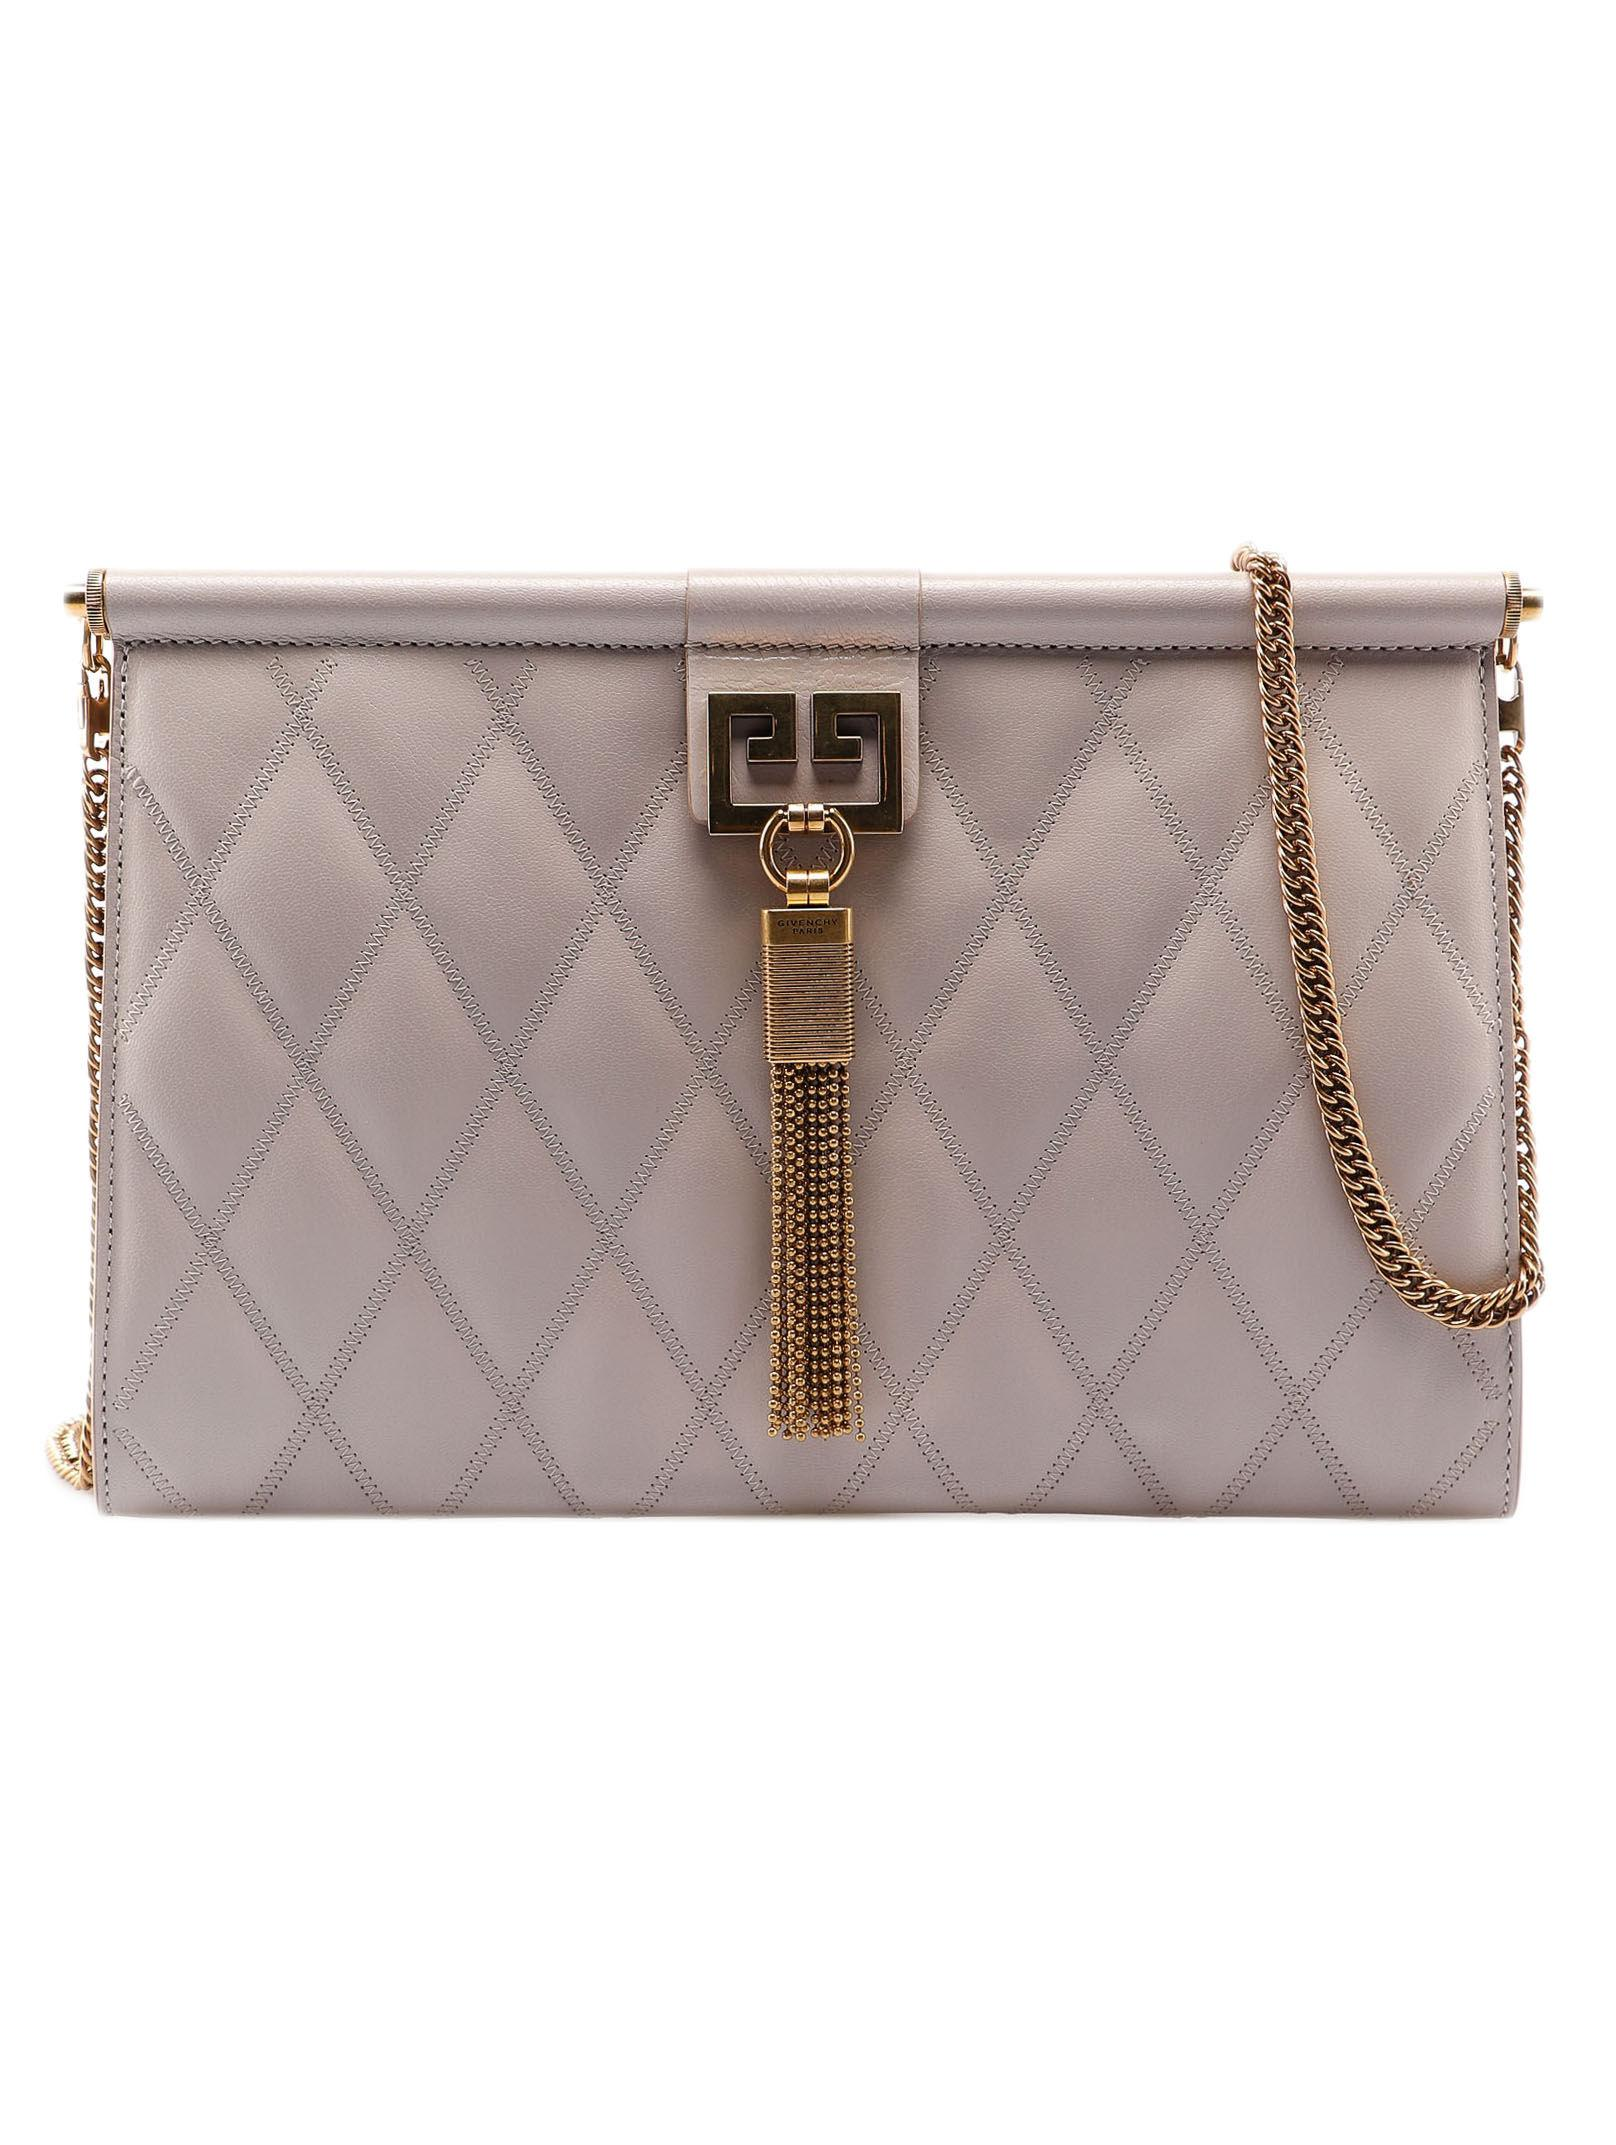 Lyst - Givenchy Gem Medium Bag in Natural 5630bae7da